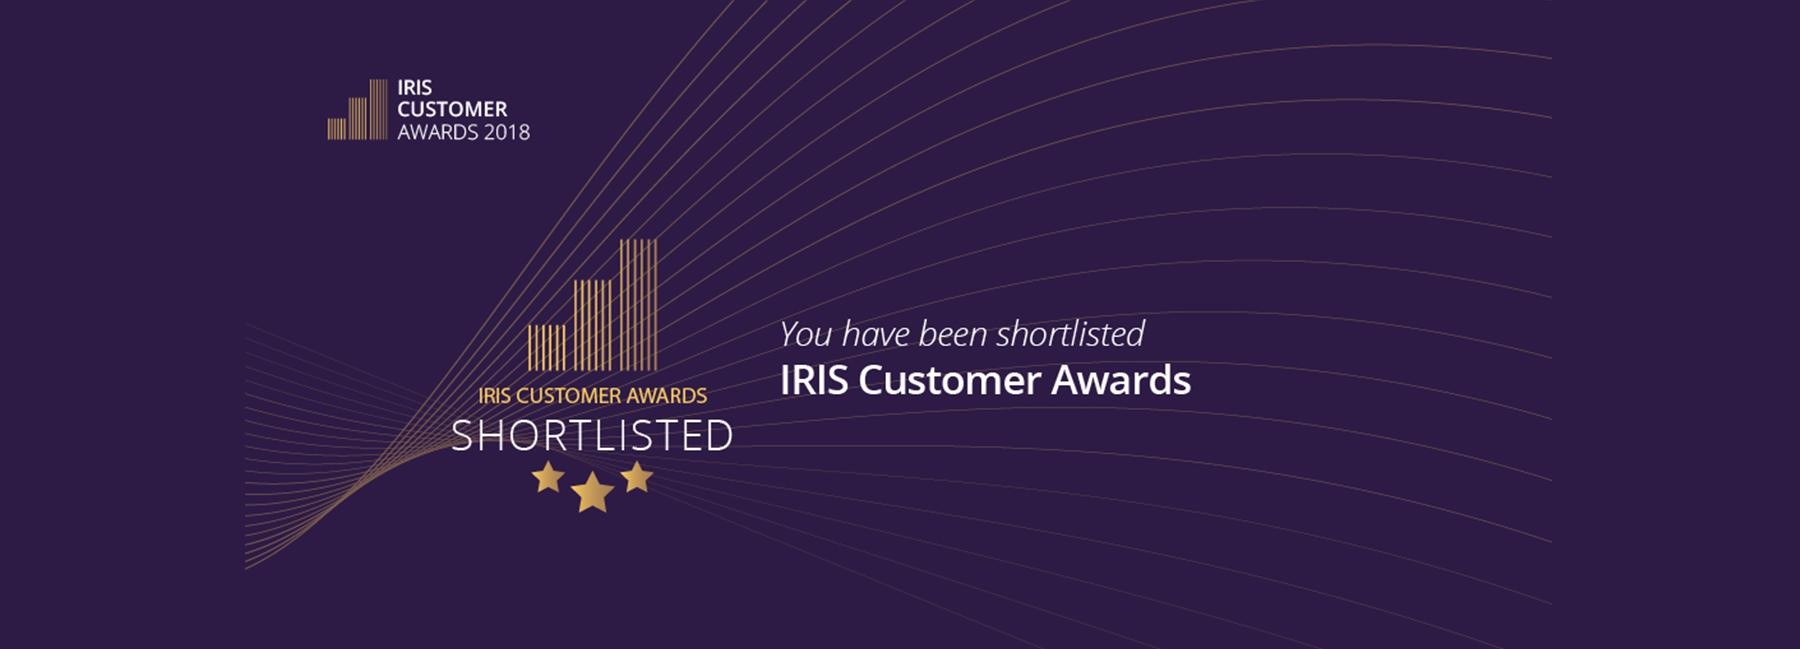 IRIS Customer Awards Shortlist Banner.